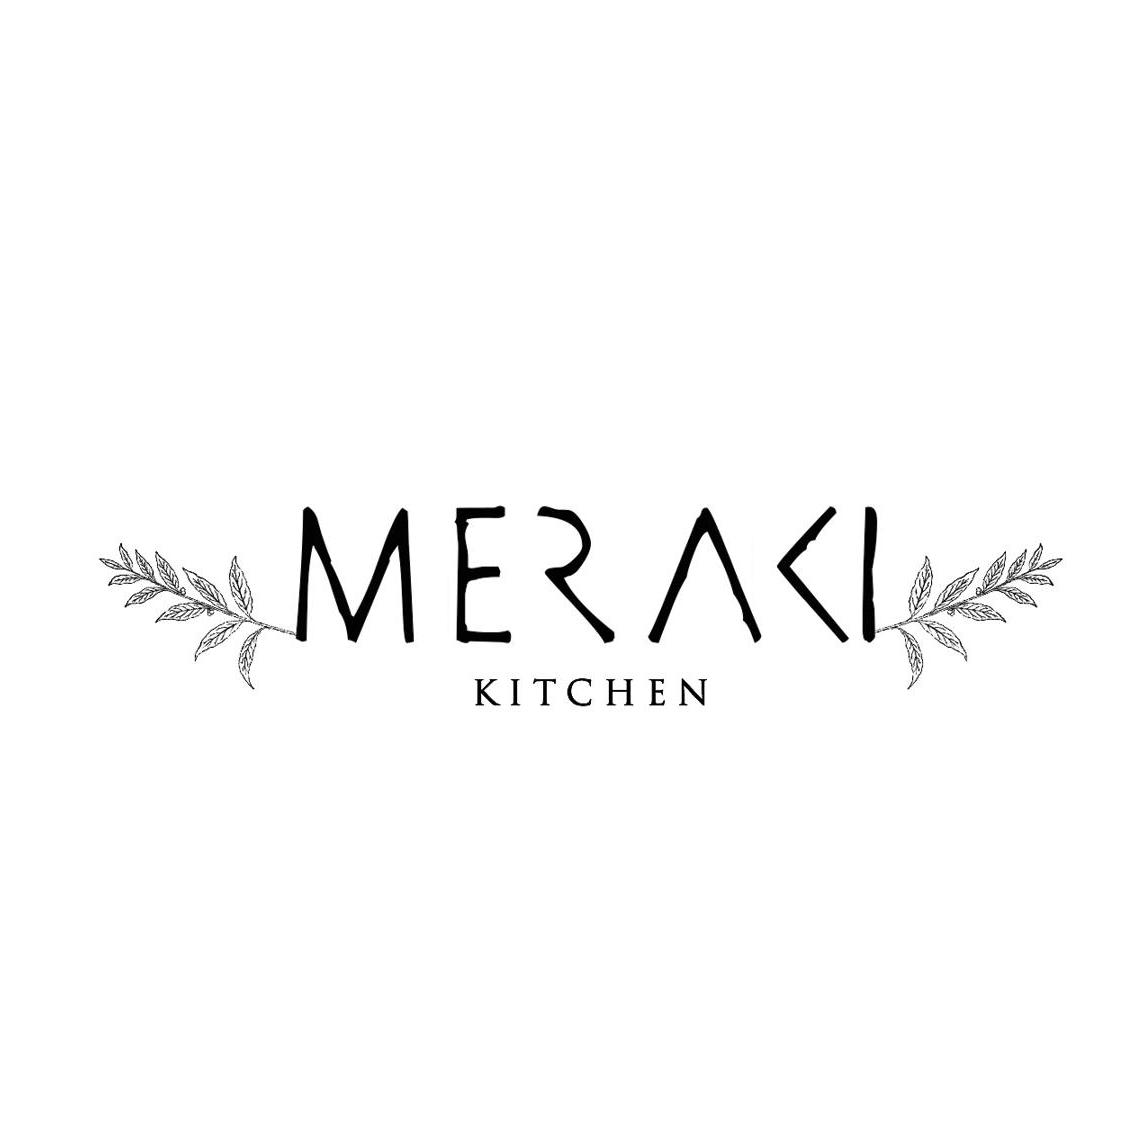 Meraki Kitchen